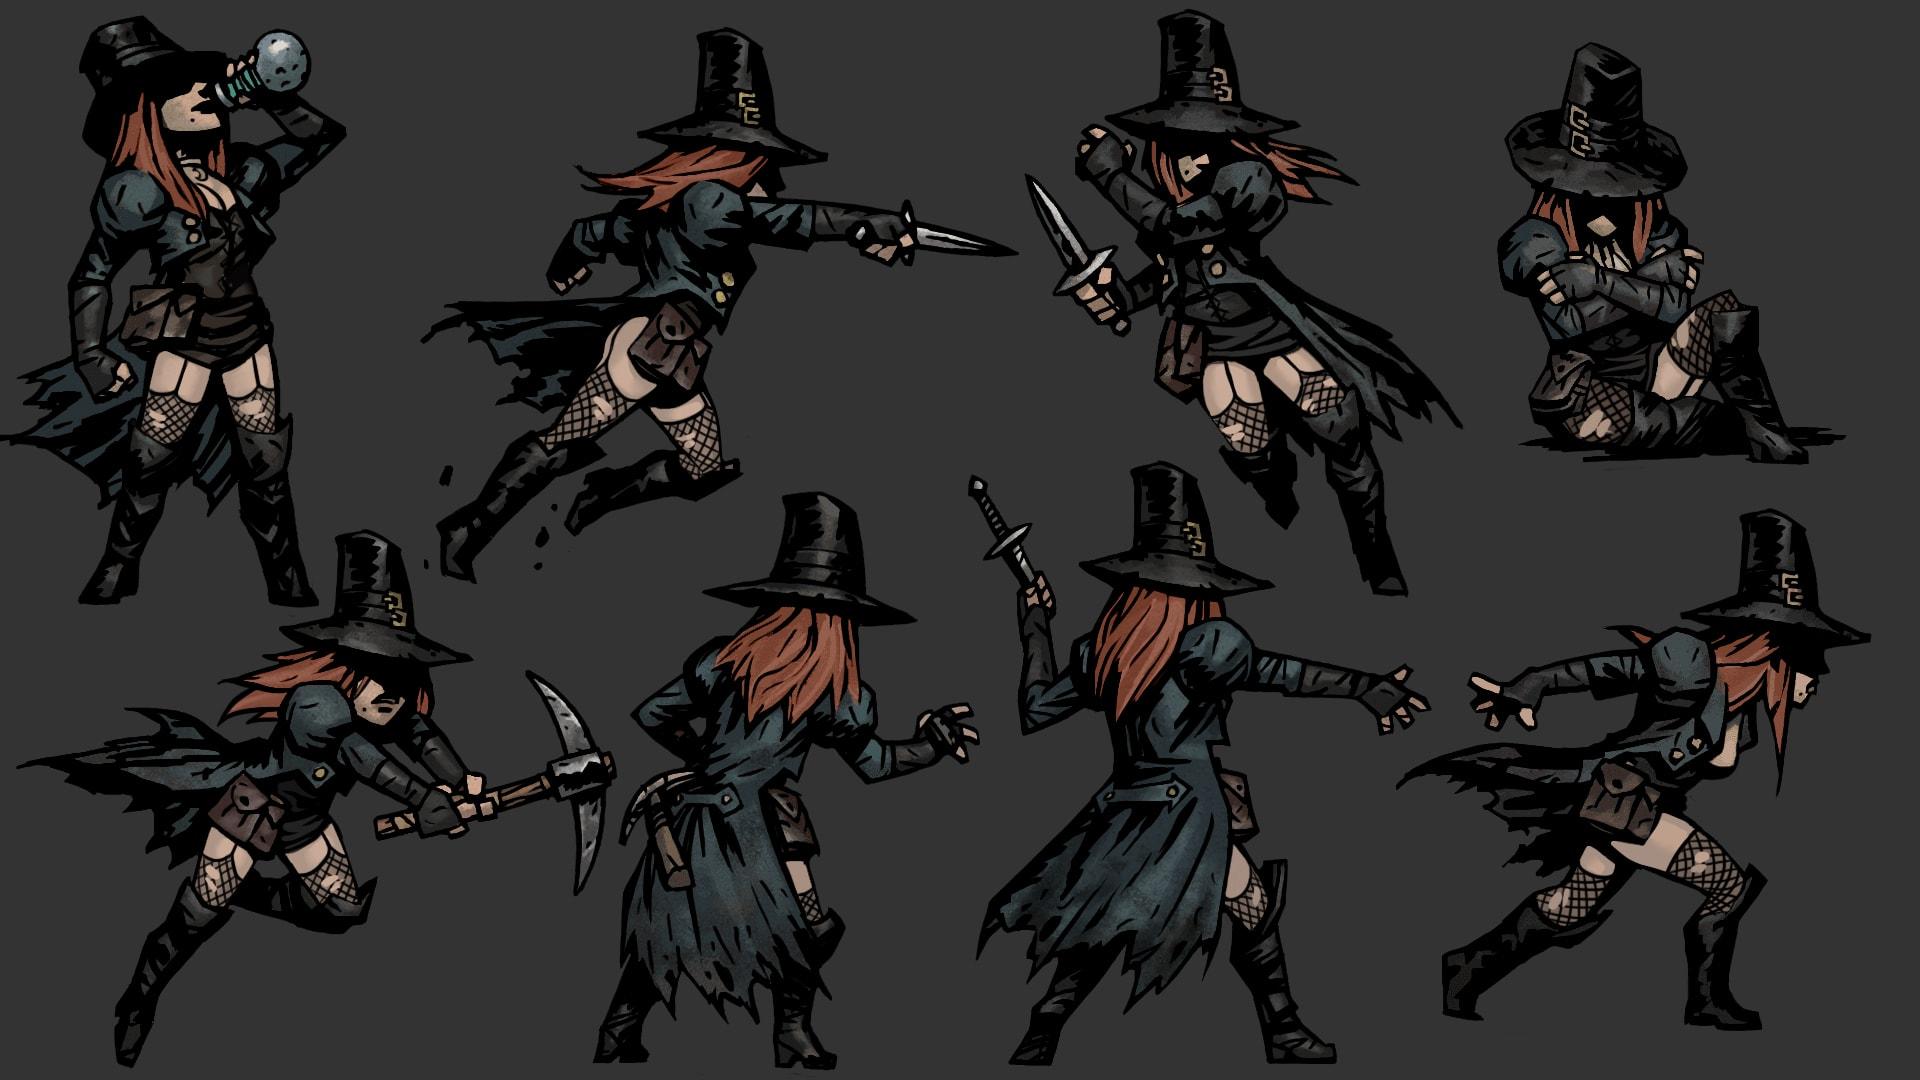 Darkest Dungeon: Grave Robber widescreen wallpapers